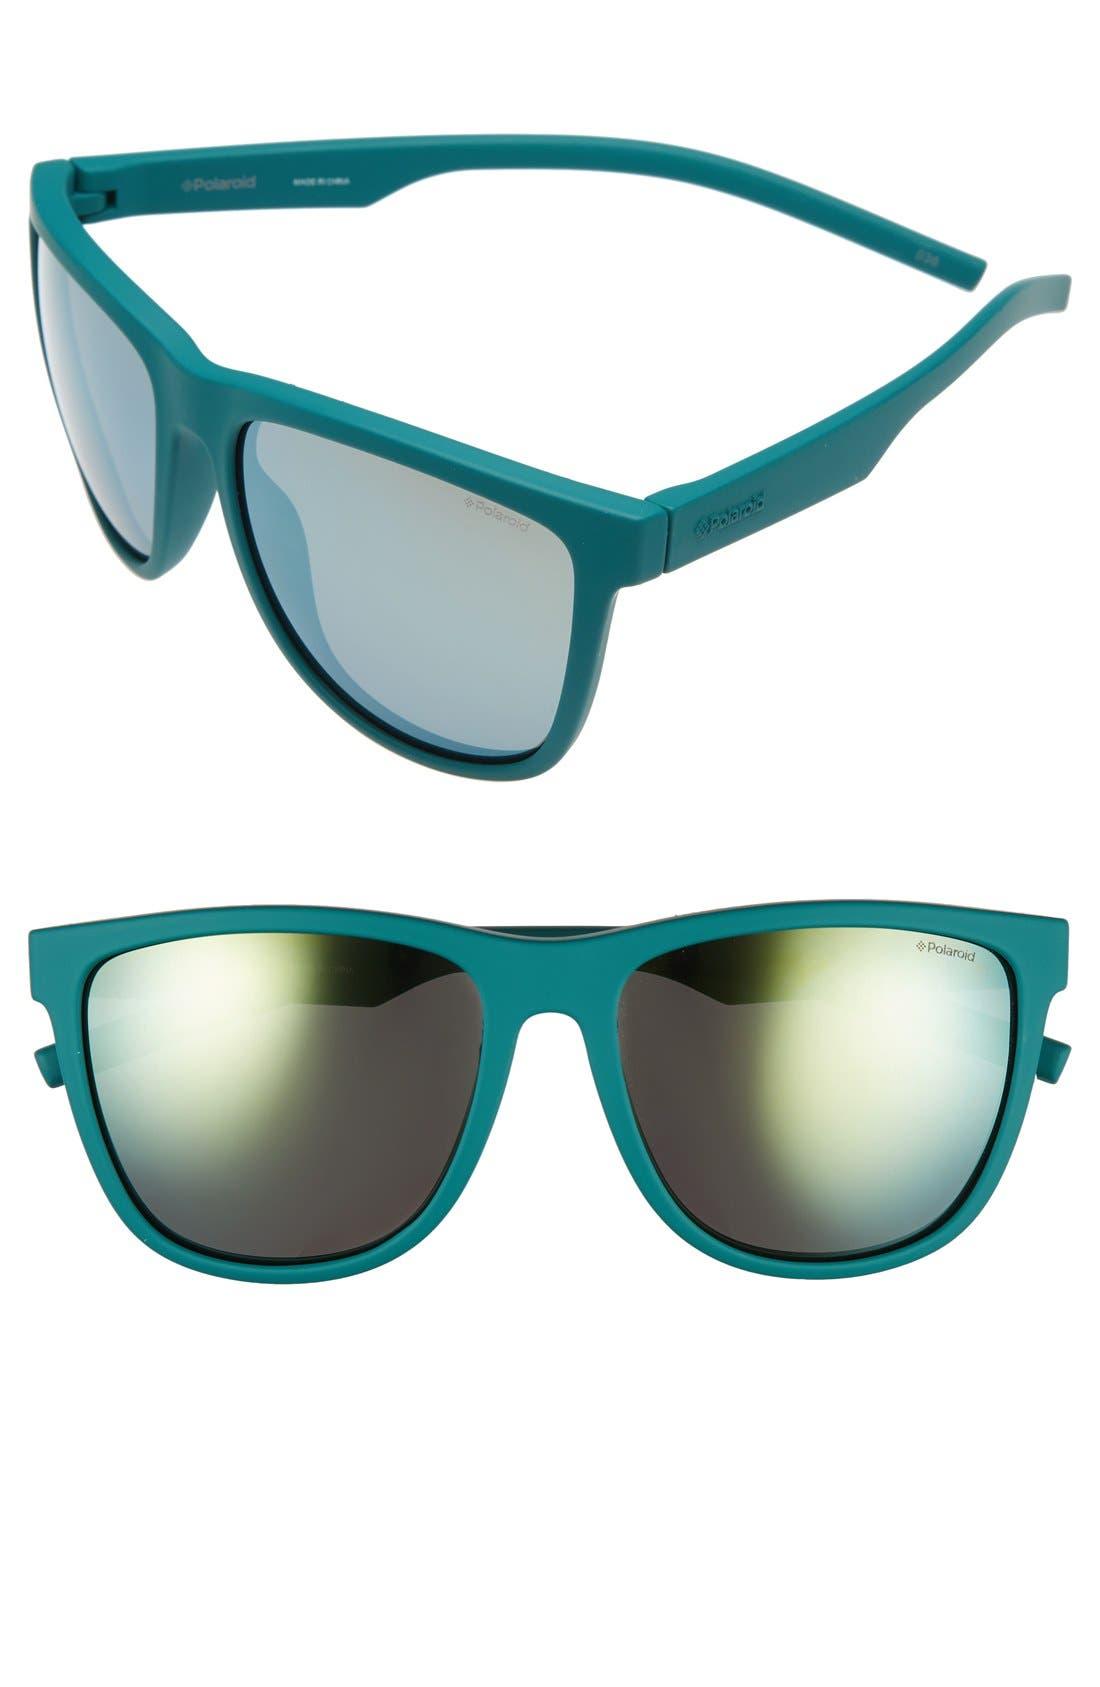 Polaroid 56mm Retro Polarized Sunglasses